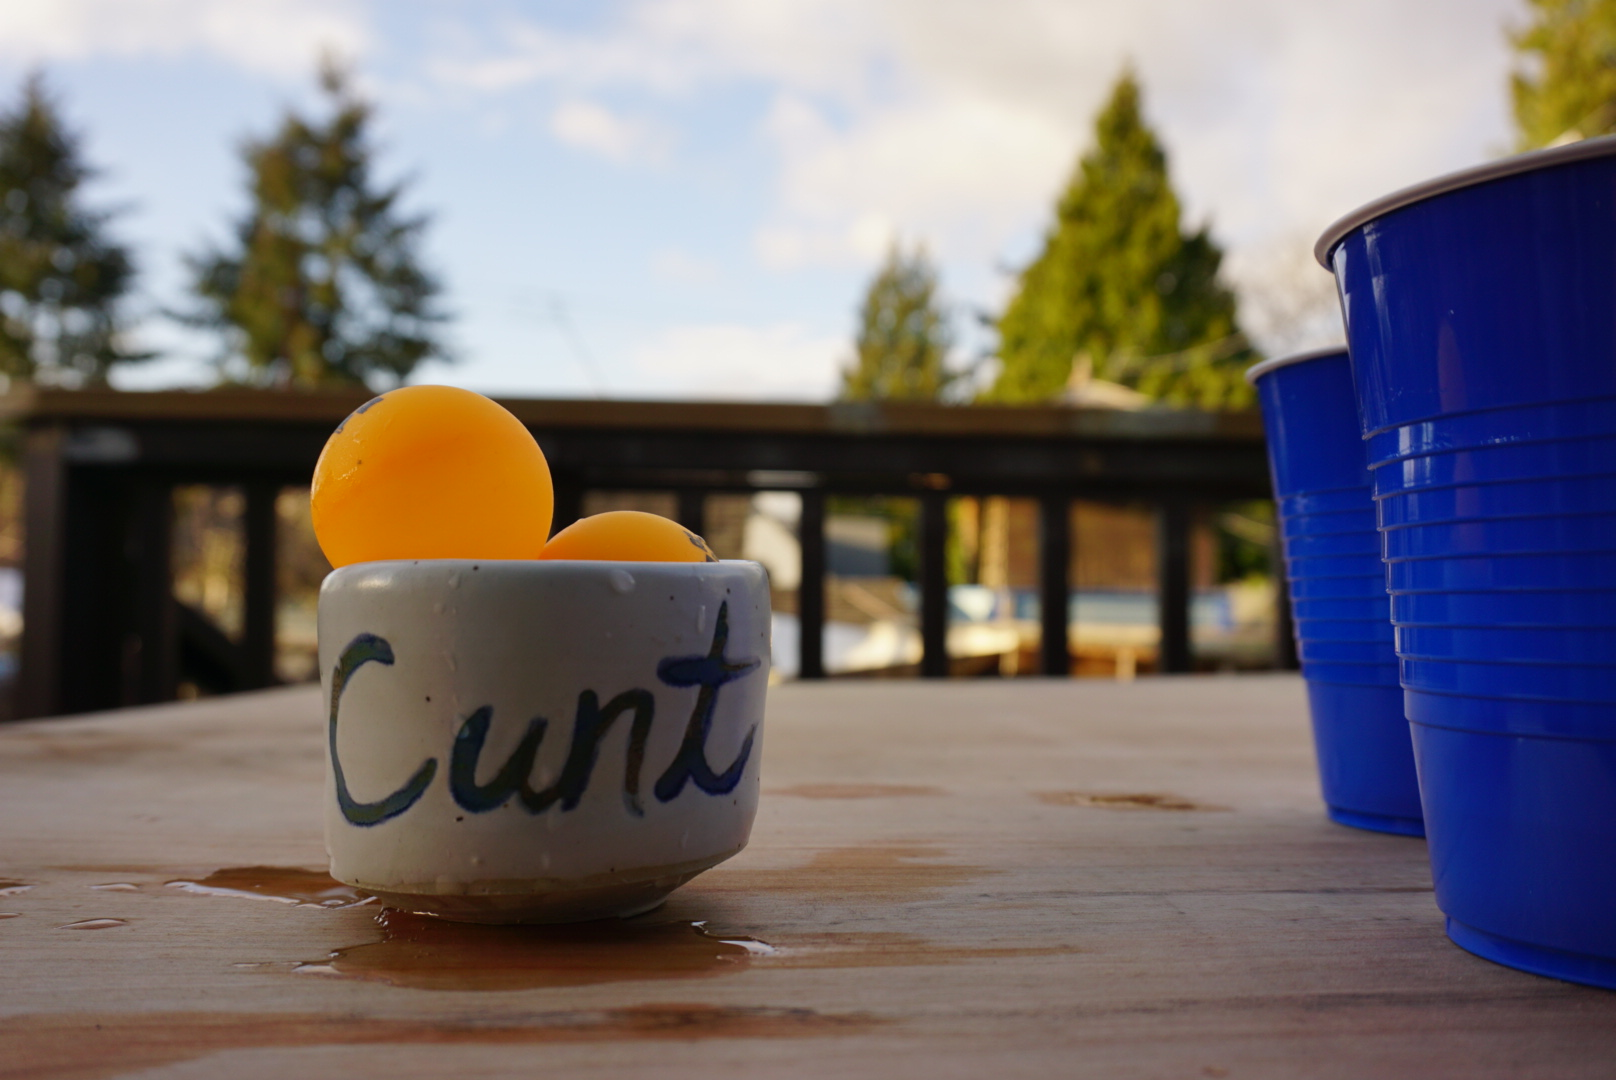 Cunt Cup.JPG